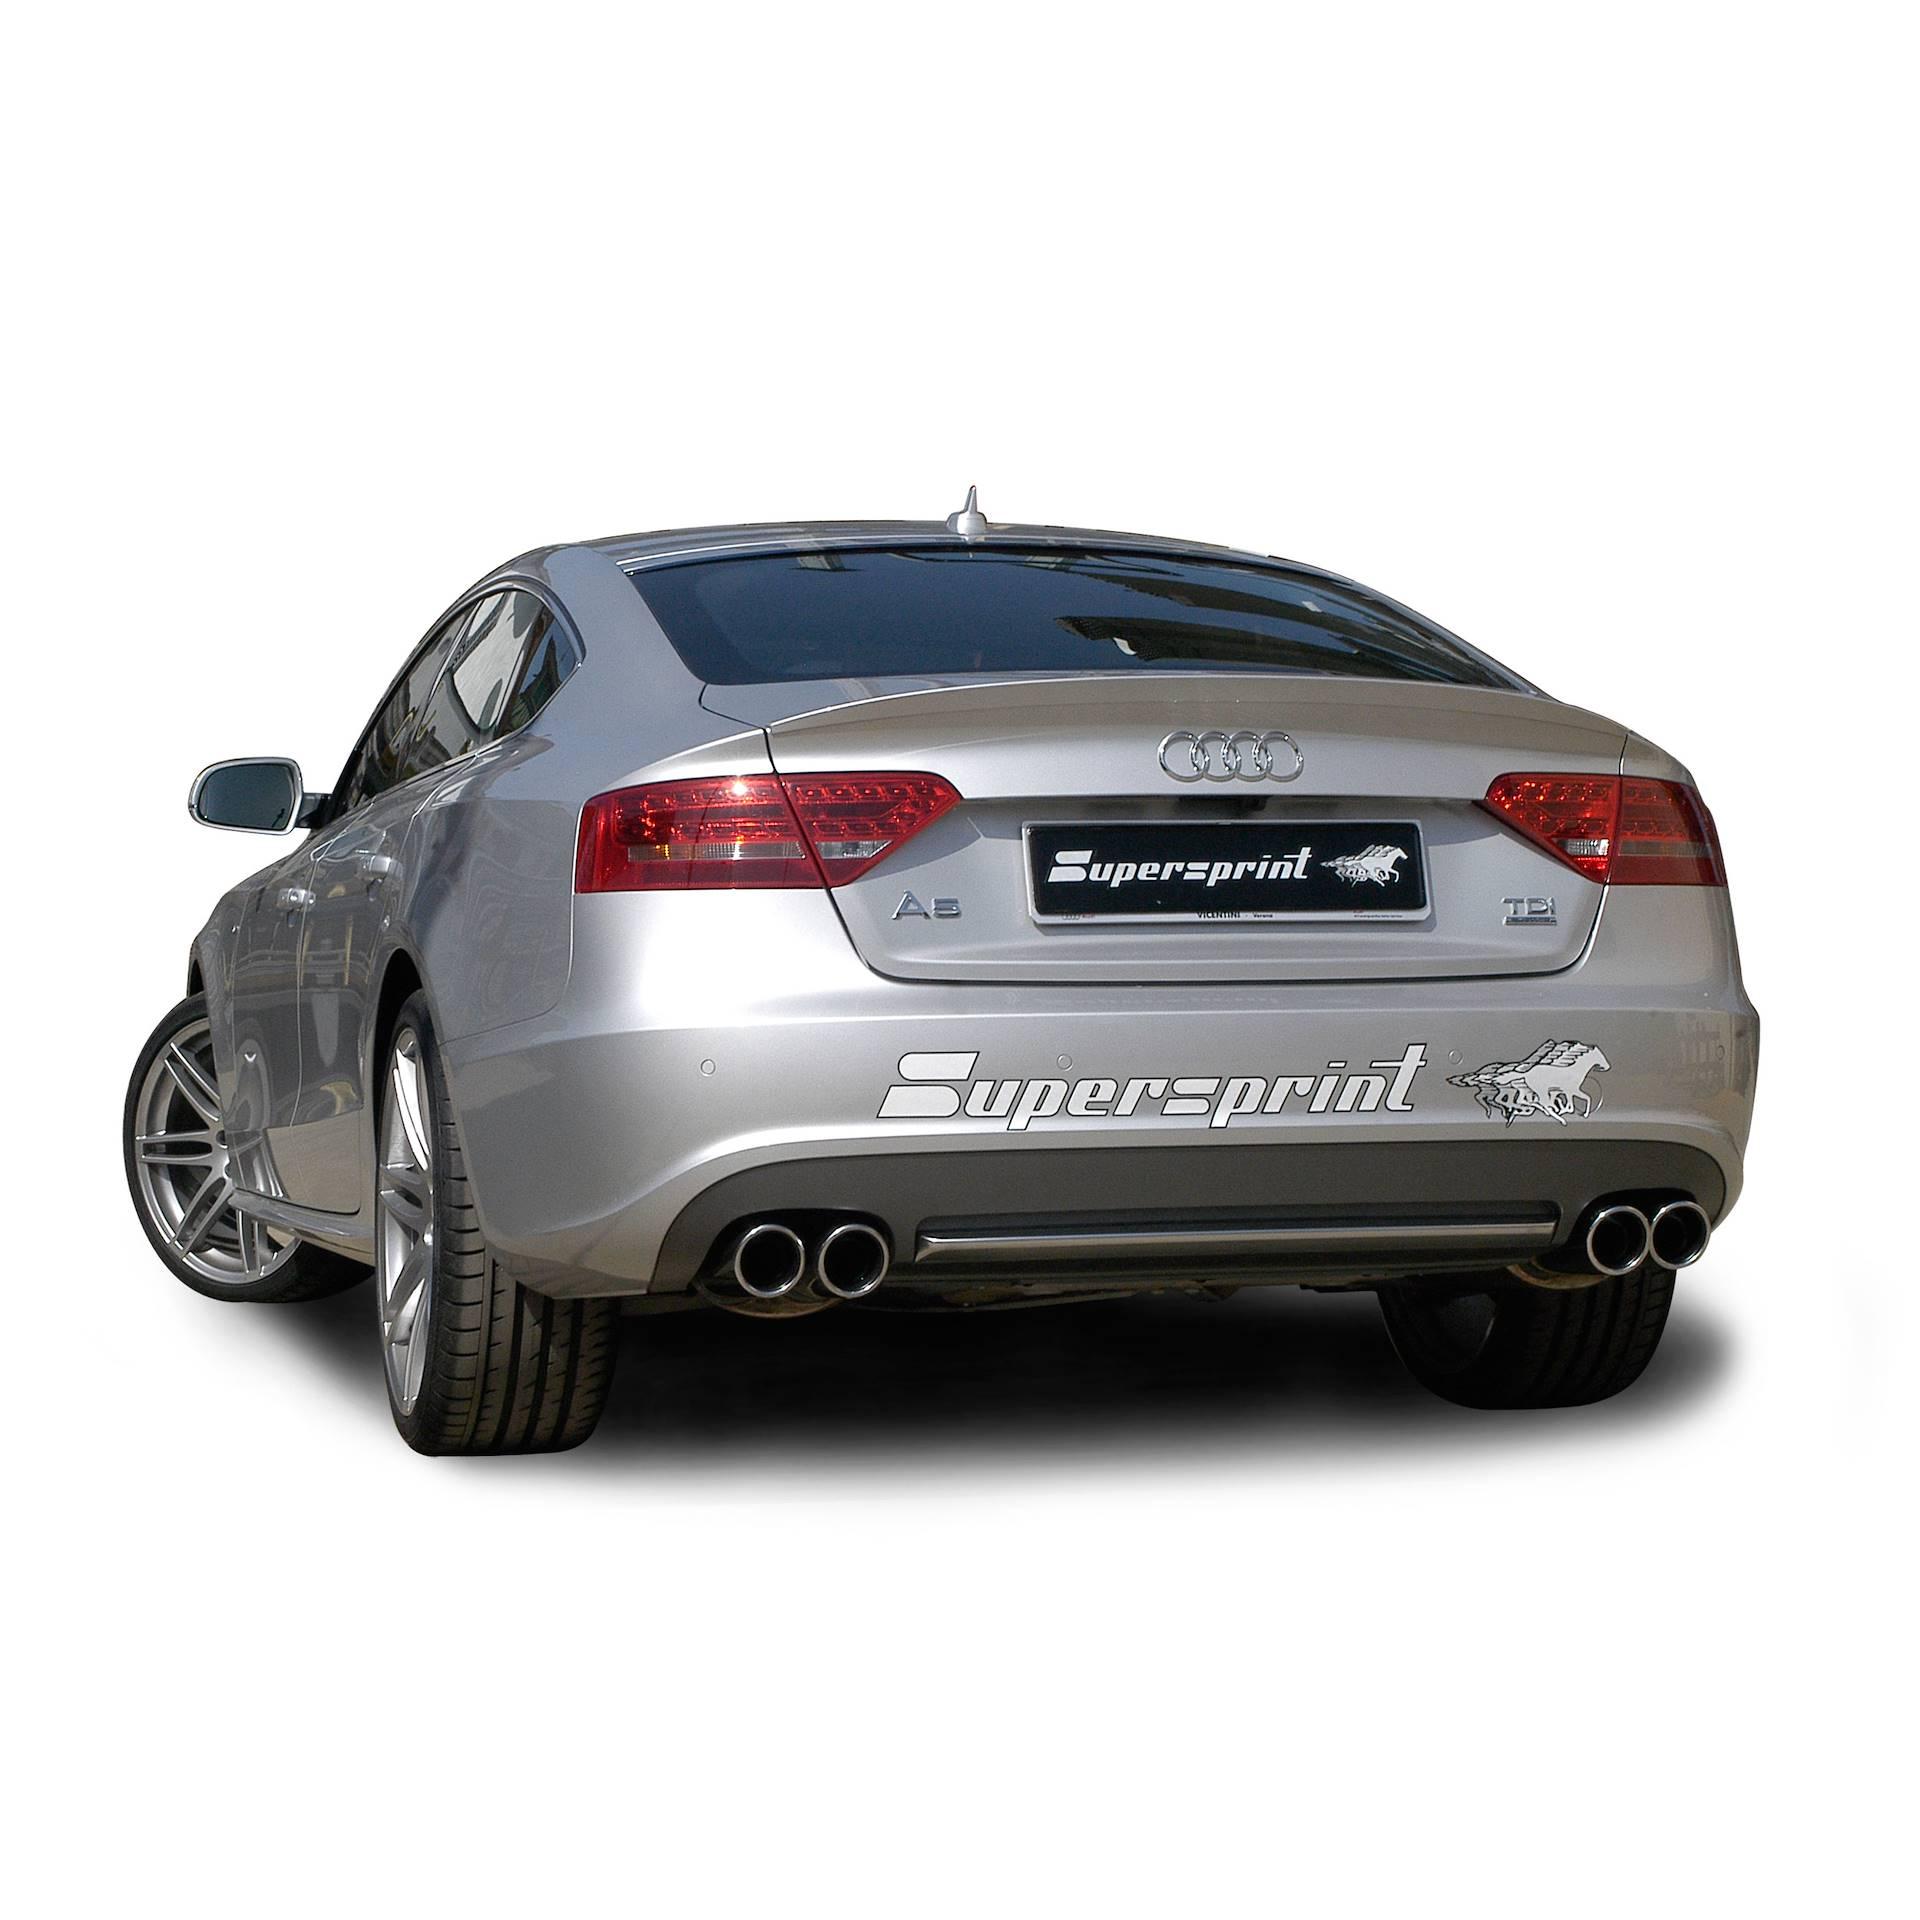 AUDI A5 Sportback 3.0 TDi V6 (204 Hp) 2011 ->2015, Audi